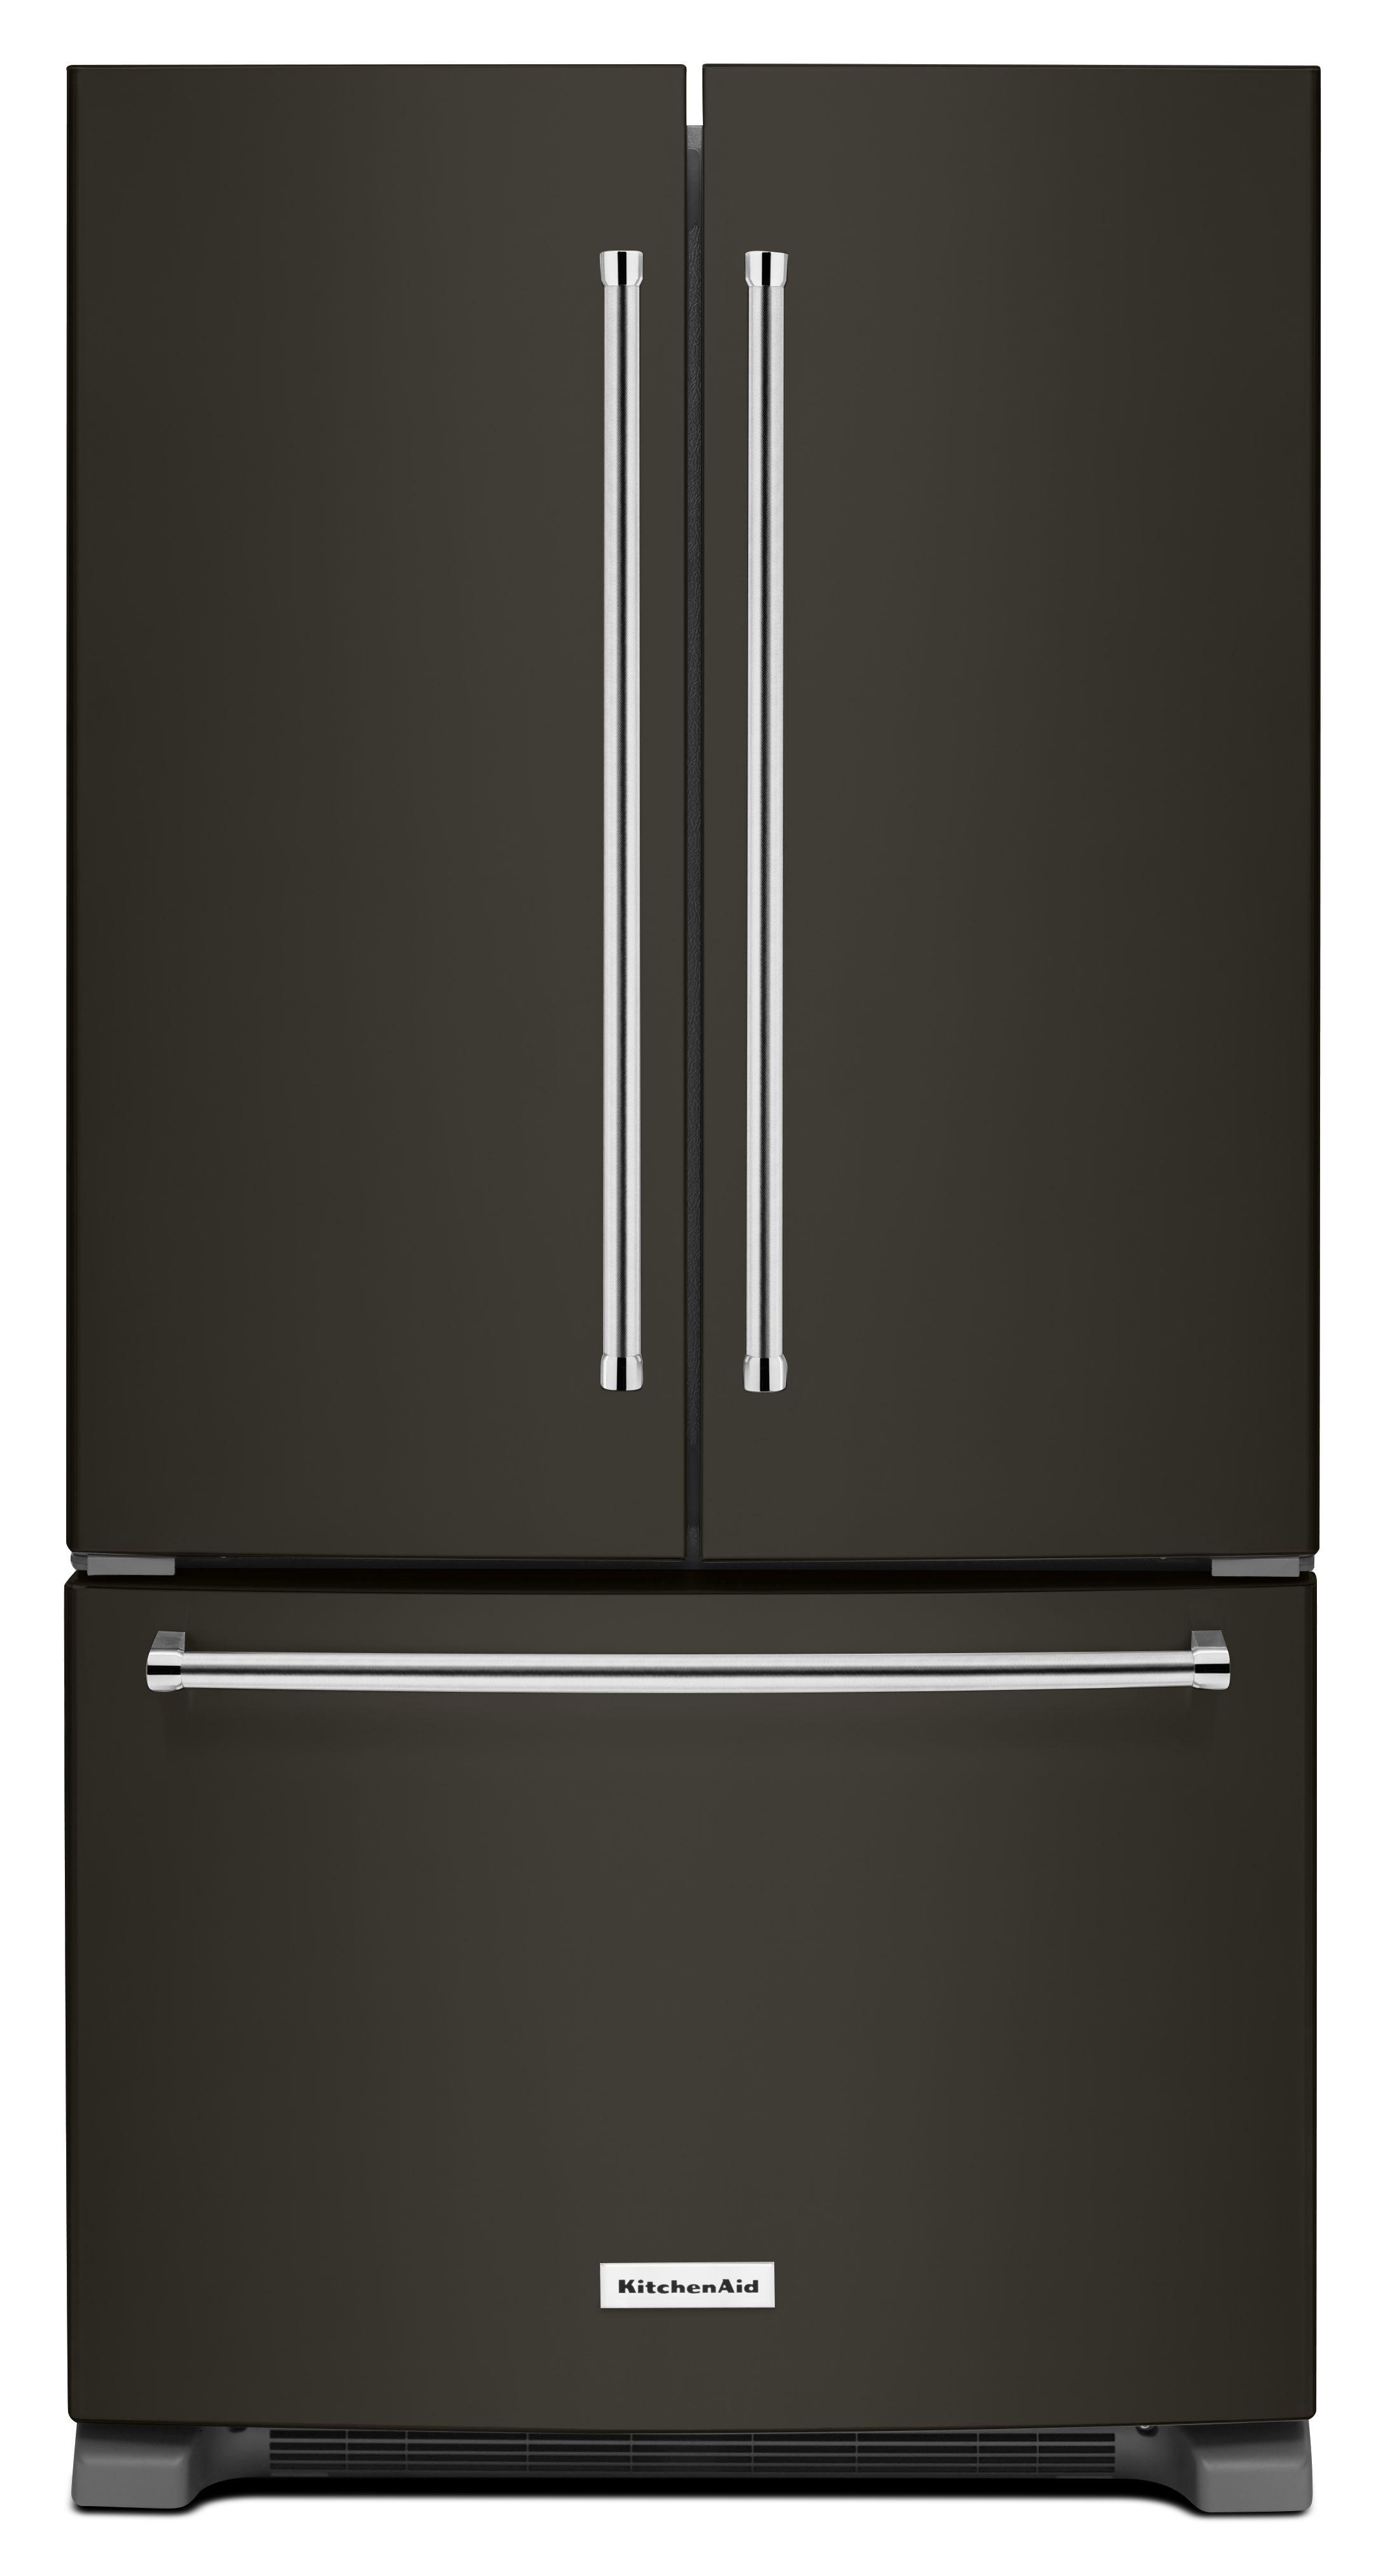 Counter Depth Refrigerator Home Appliance, Kitchen Appliance in ...